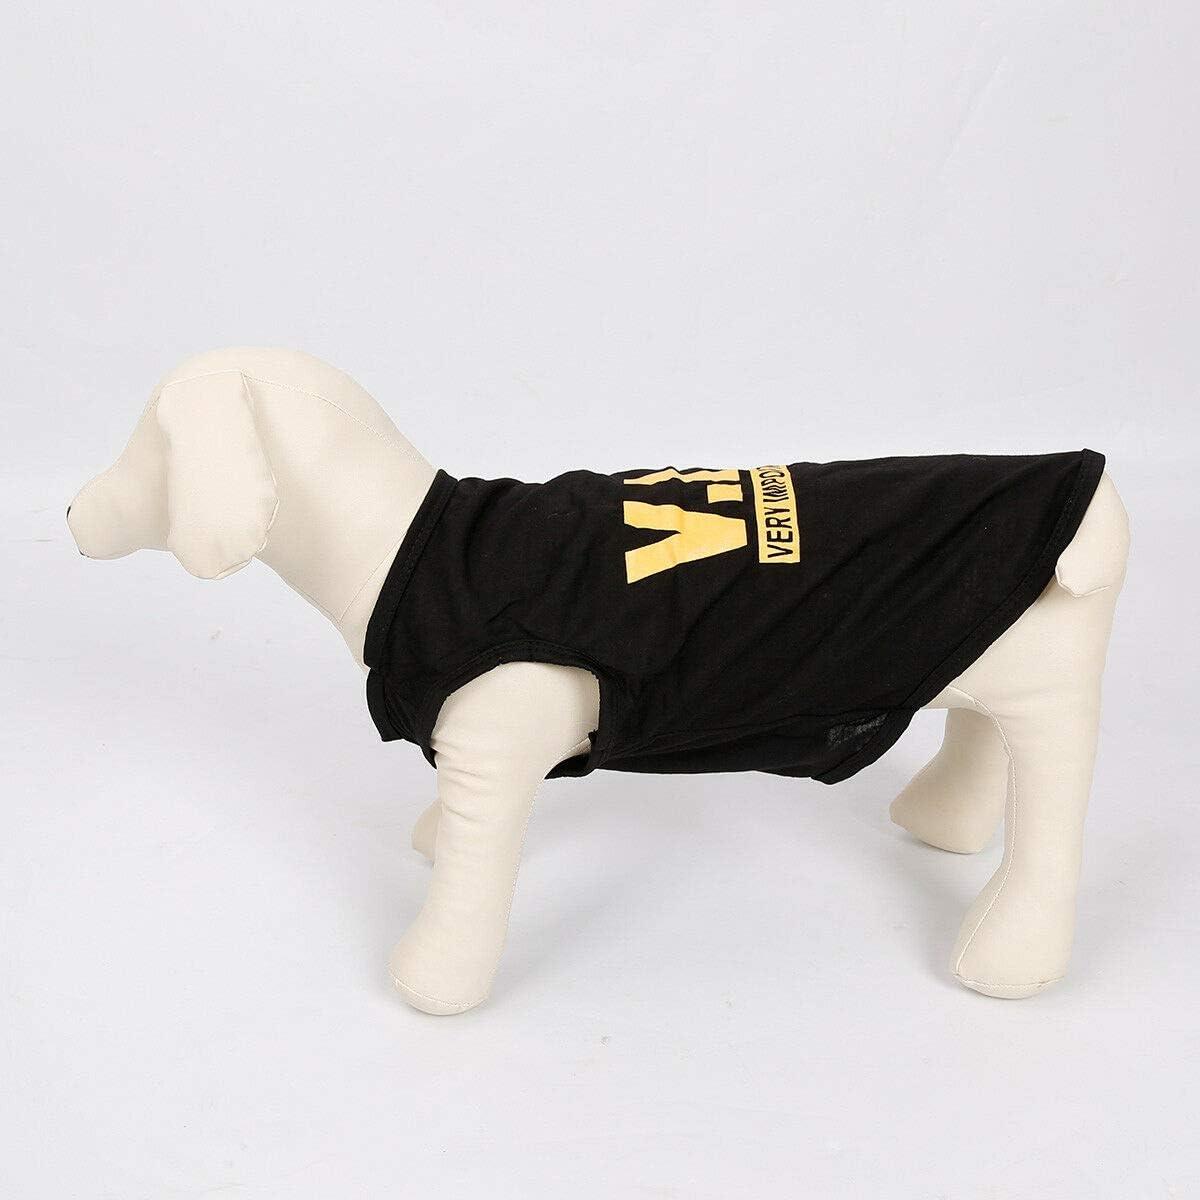 XS to L GJDLLC Black VIP Dog T-Shirt Small Dog Shirt Cat T Shirt Puppy Dog Clothes Dog Basics